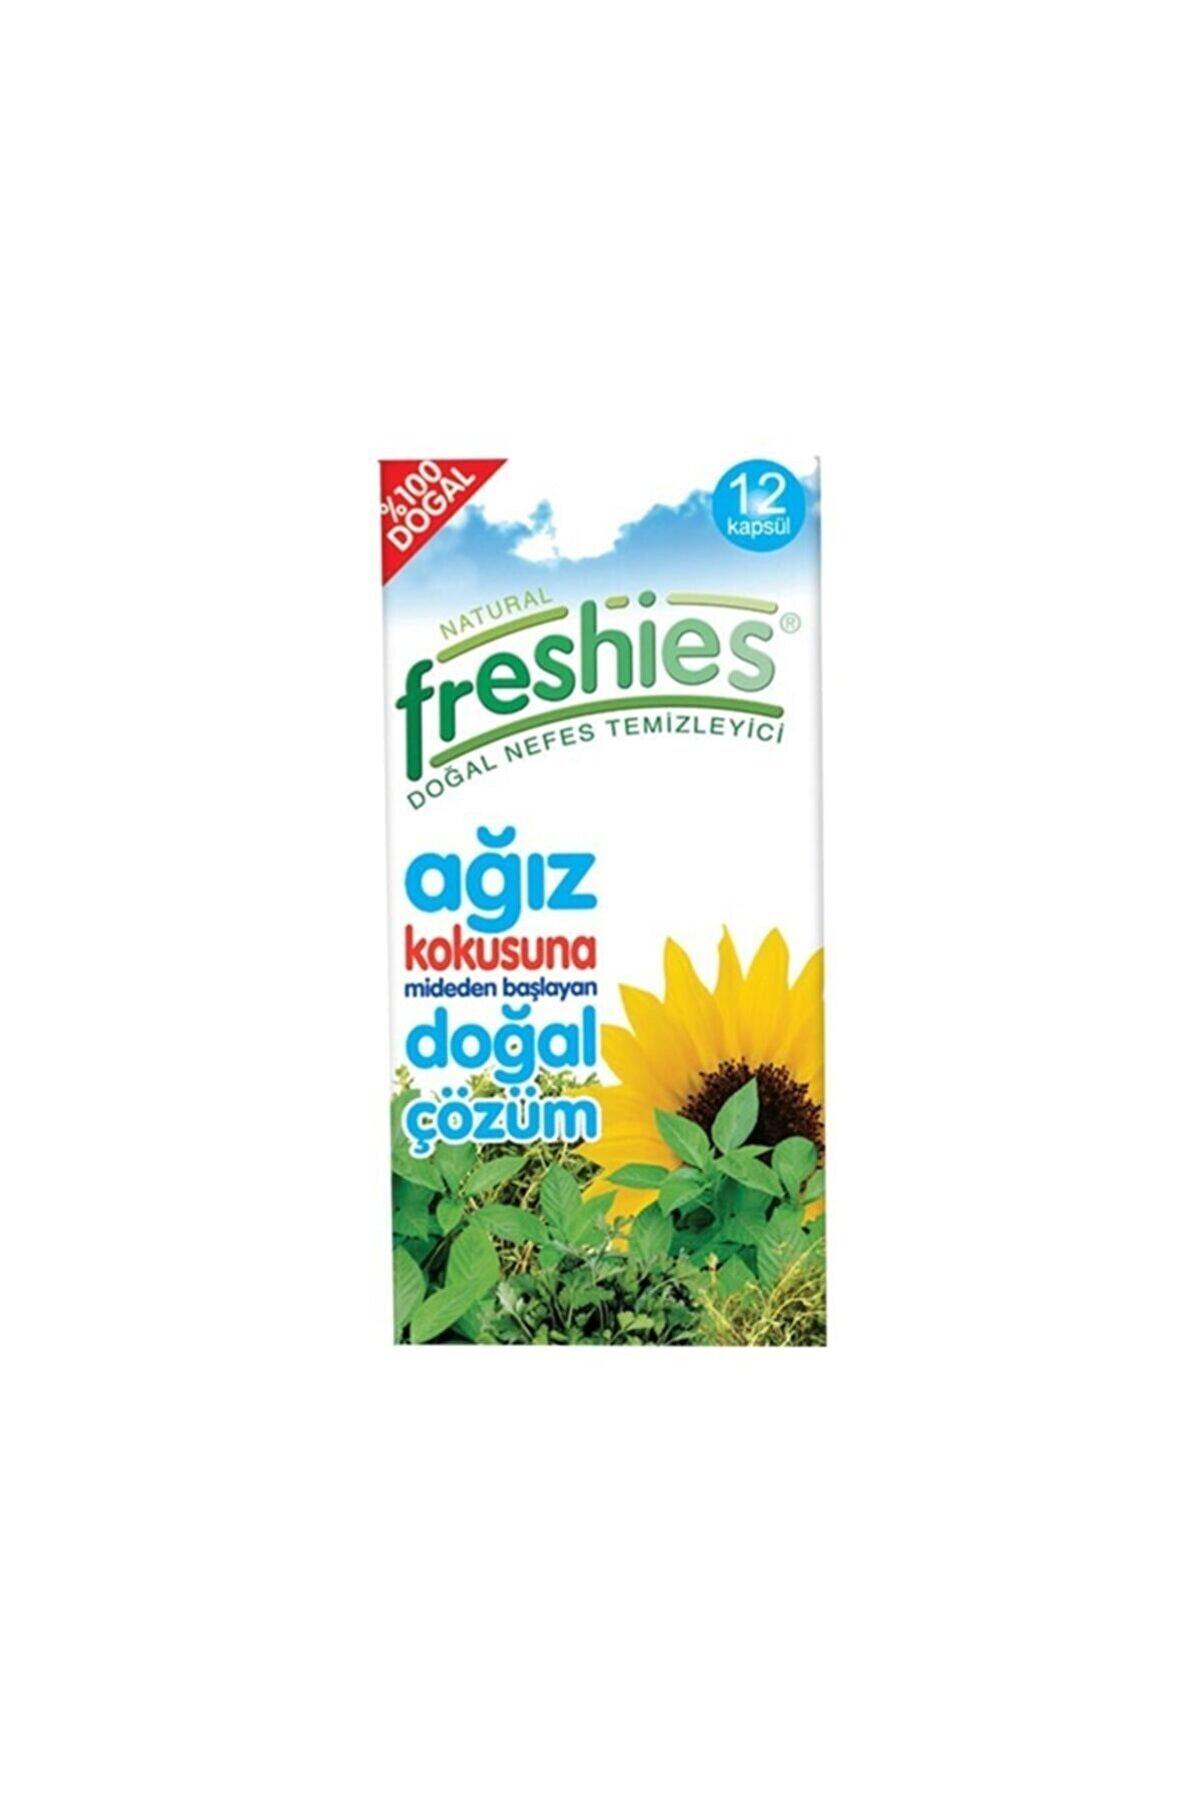 Freshies Ağız Kokusu Önleyici 24 Kapsül